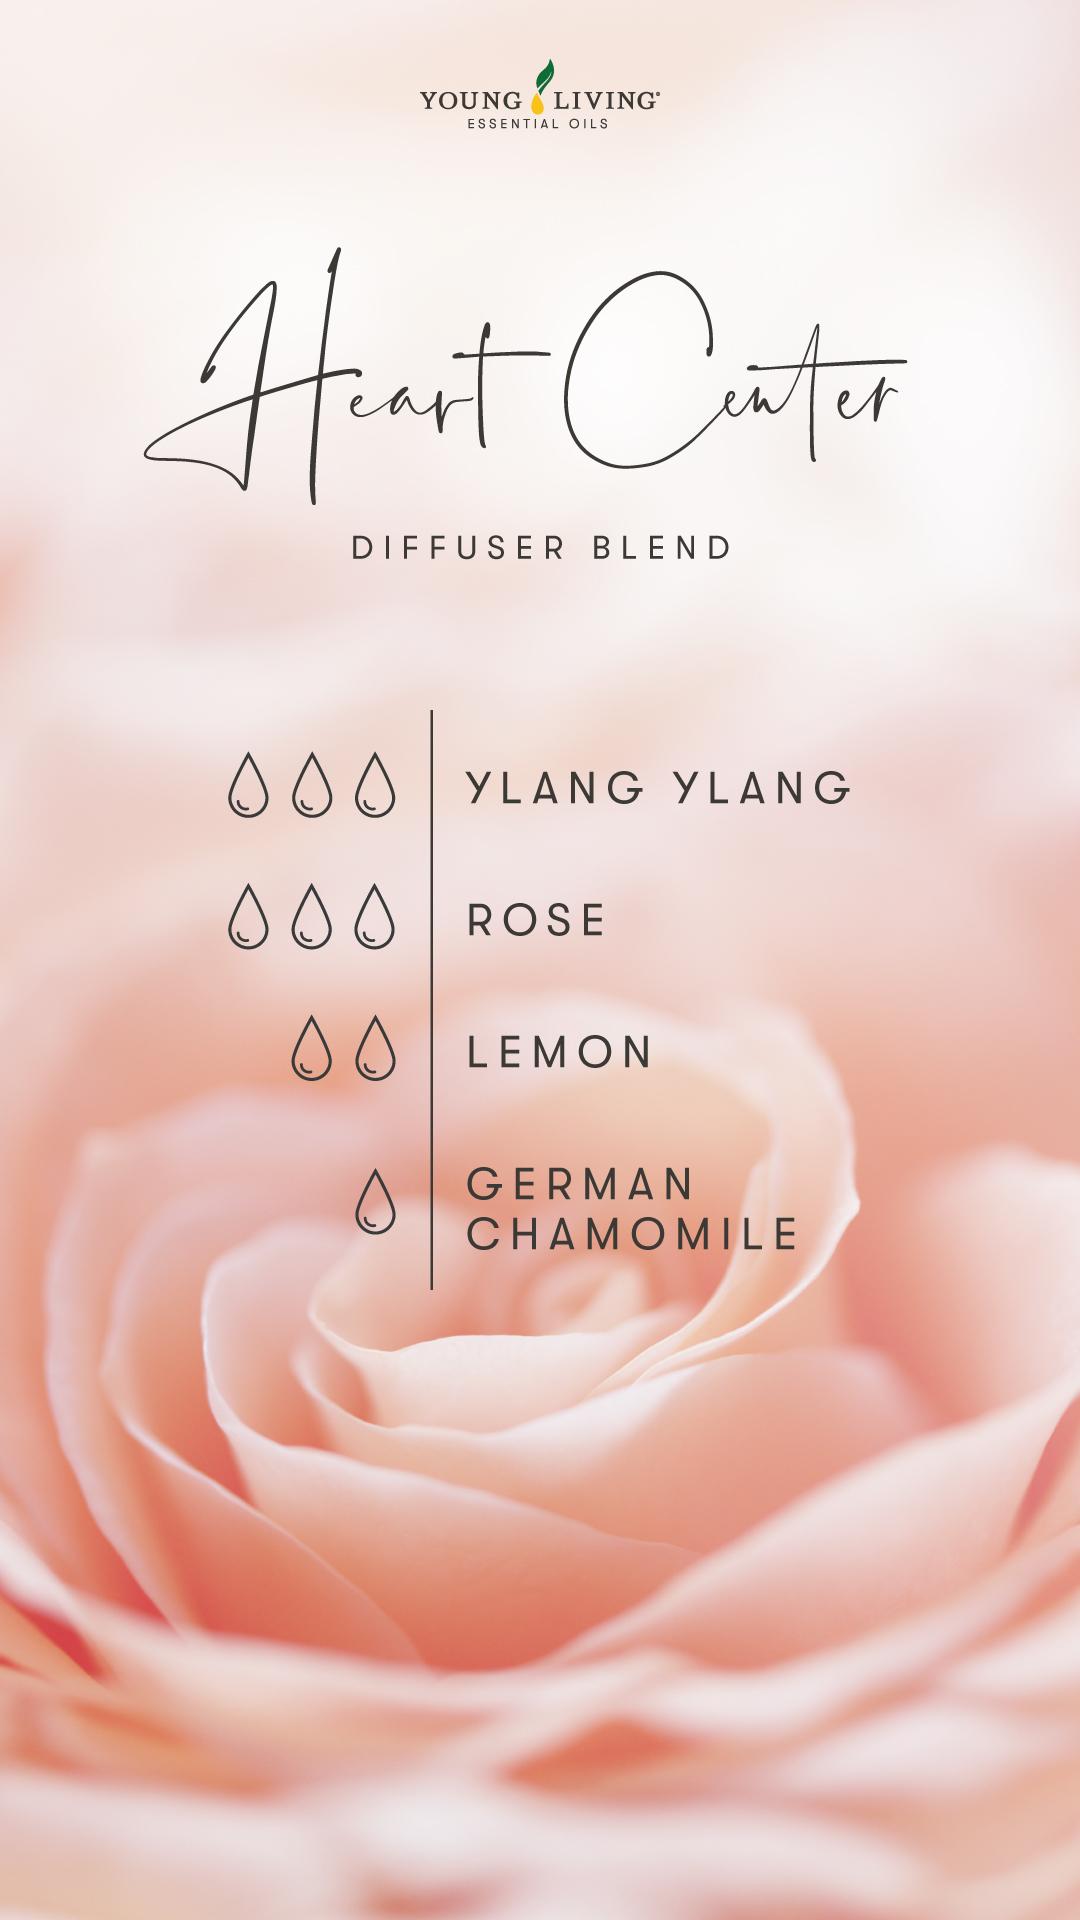 Heart Center Diffuser Blend - 3 drops Ylang Ylang, 3 drops Rose, 2 drops Lemon, 1 drop German Chamomile